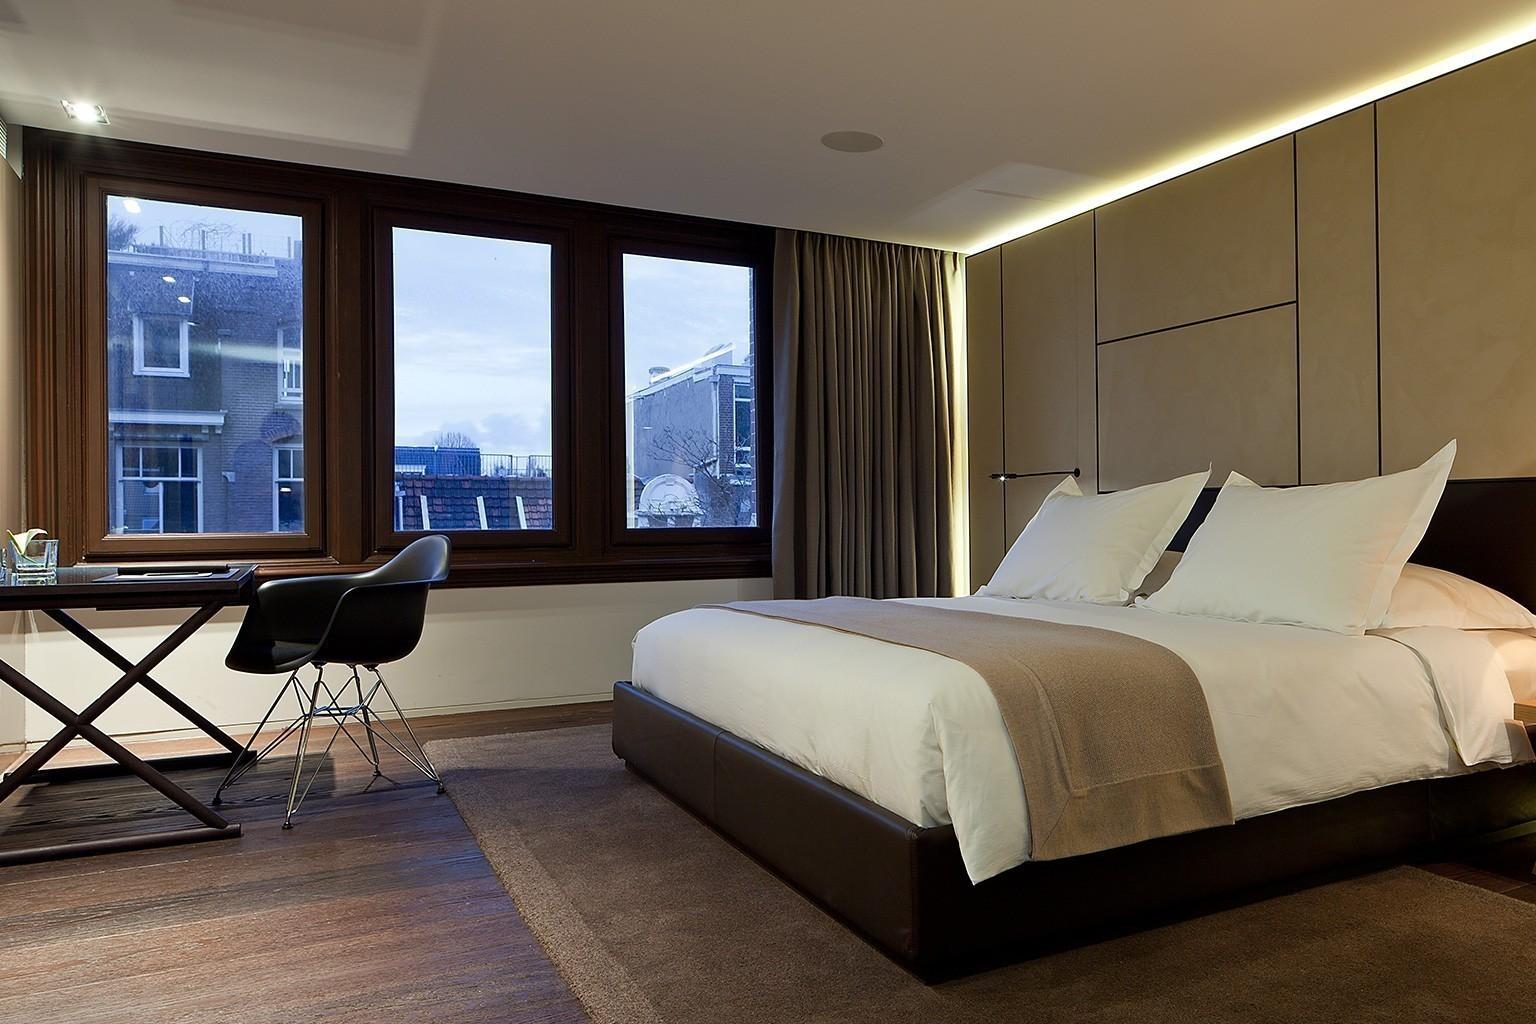 Conservatorium hotel in amsterdam designreisen for Design hotel niederlande